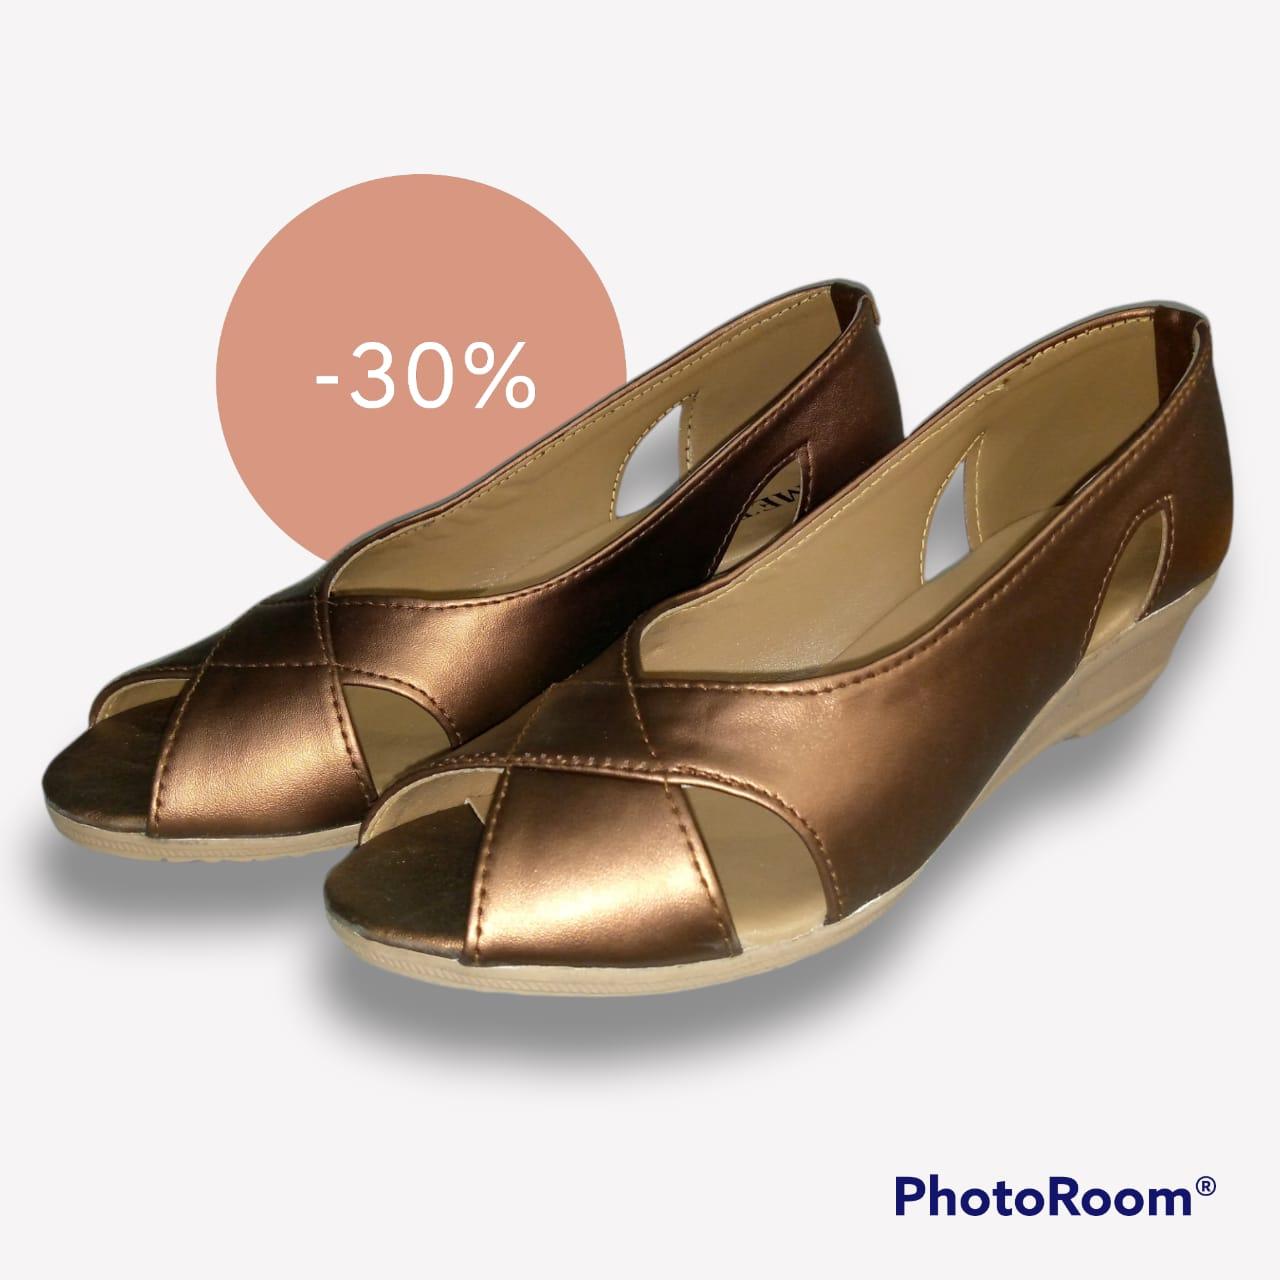 Metro Wedge Sandal for Women - American Shoes